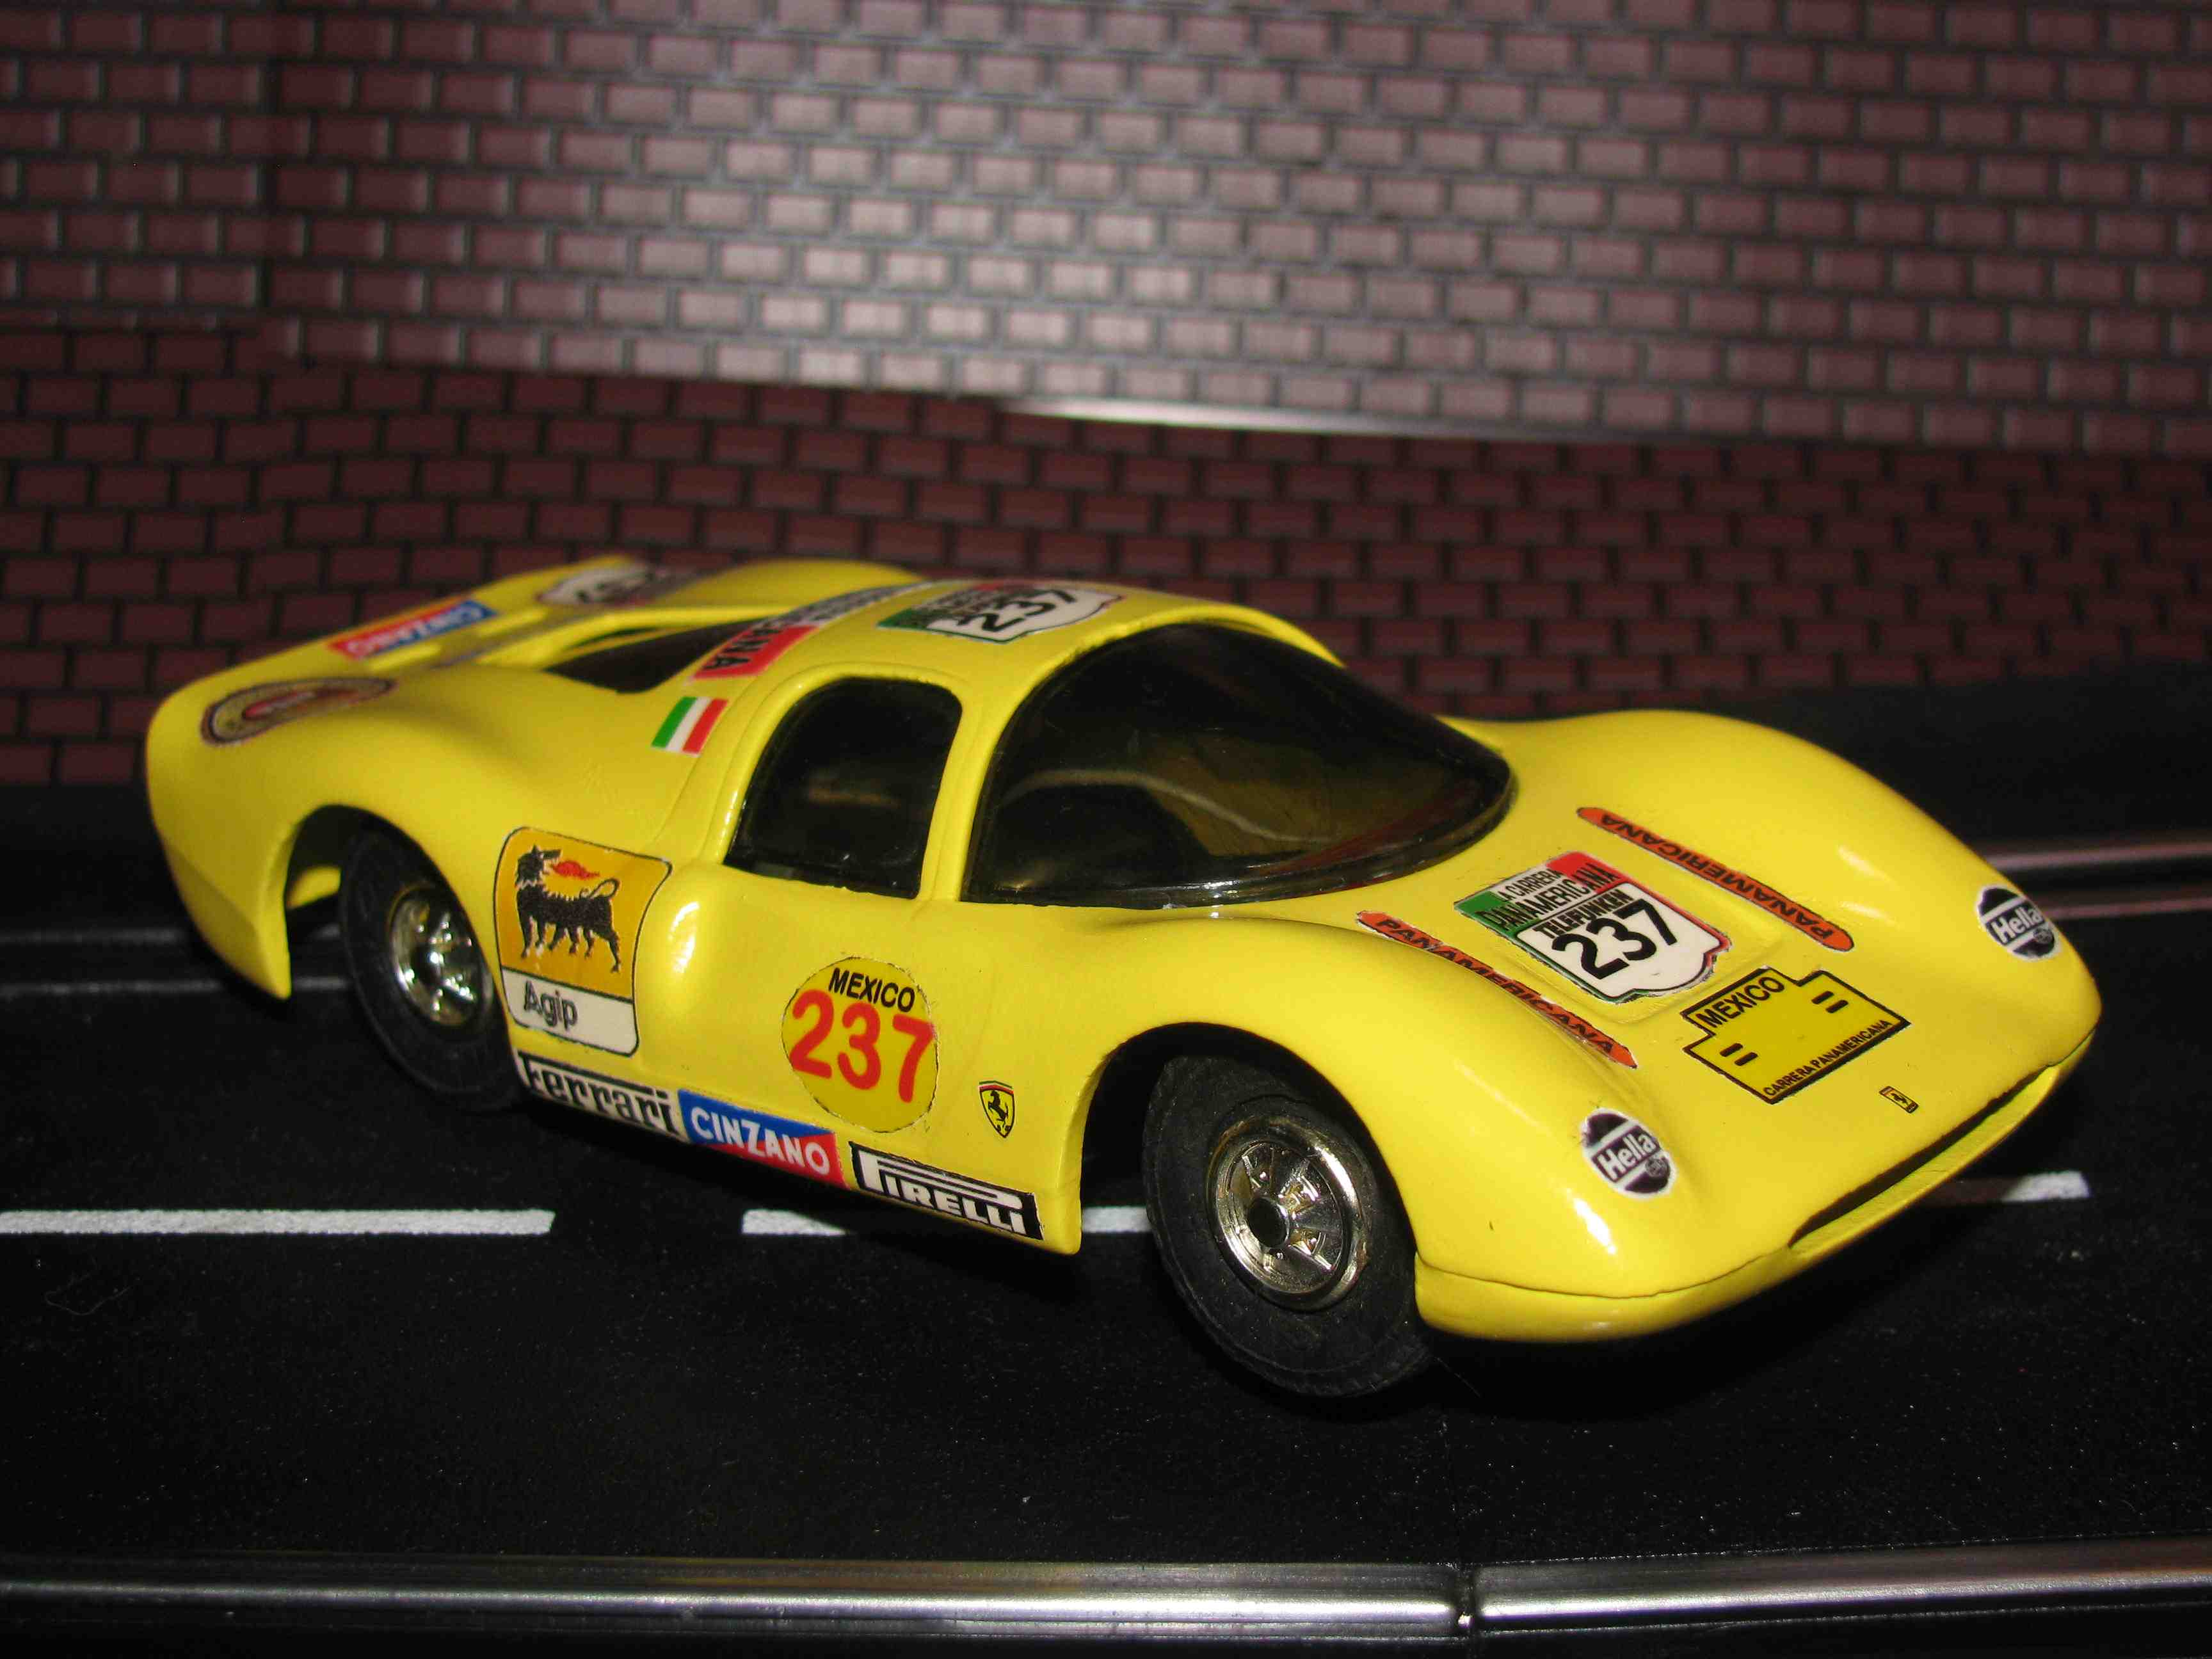 * SOLD * Eldon Ferrari P-3 – Yellow – Car 237 - #1351-12 – Carrera Panamericana Livery